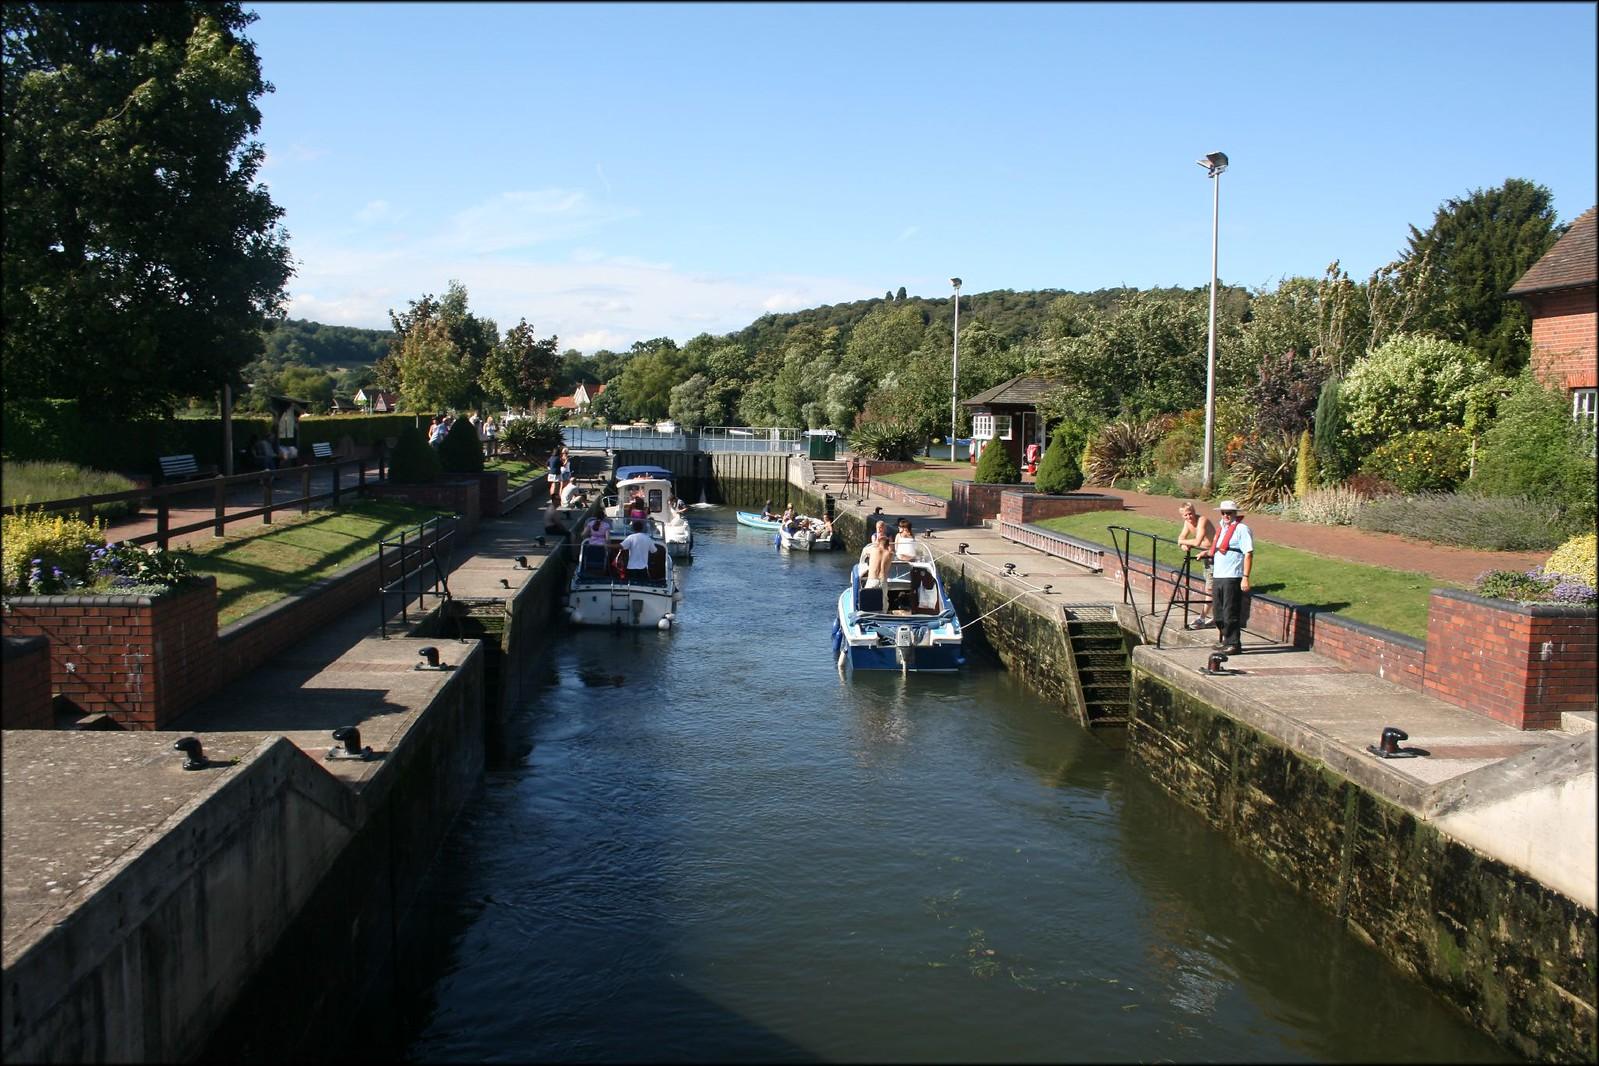 Hambleden Lock